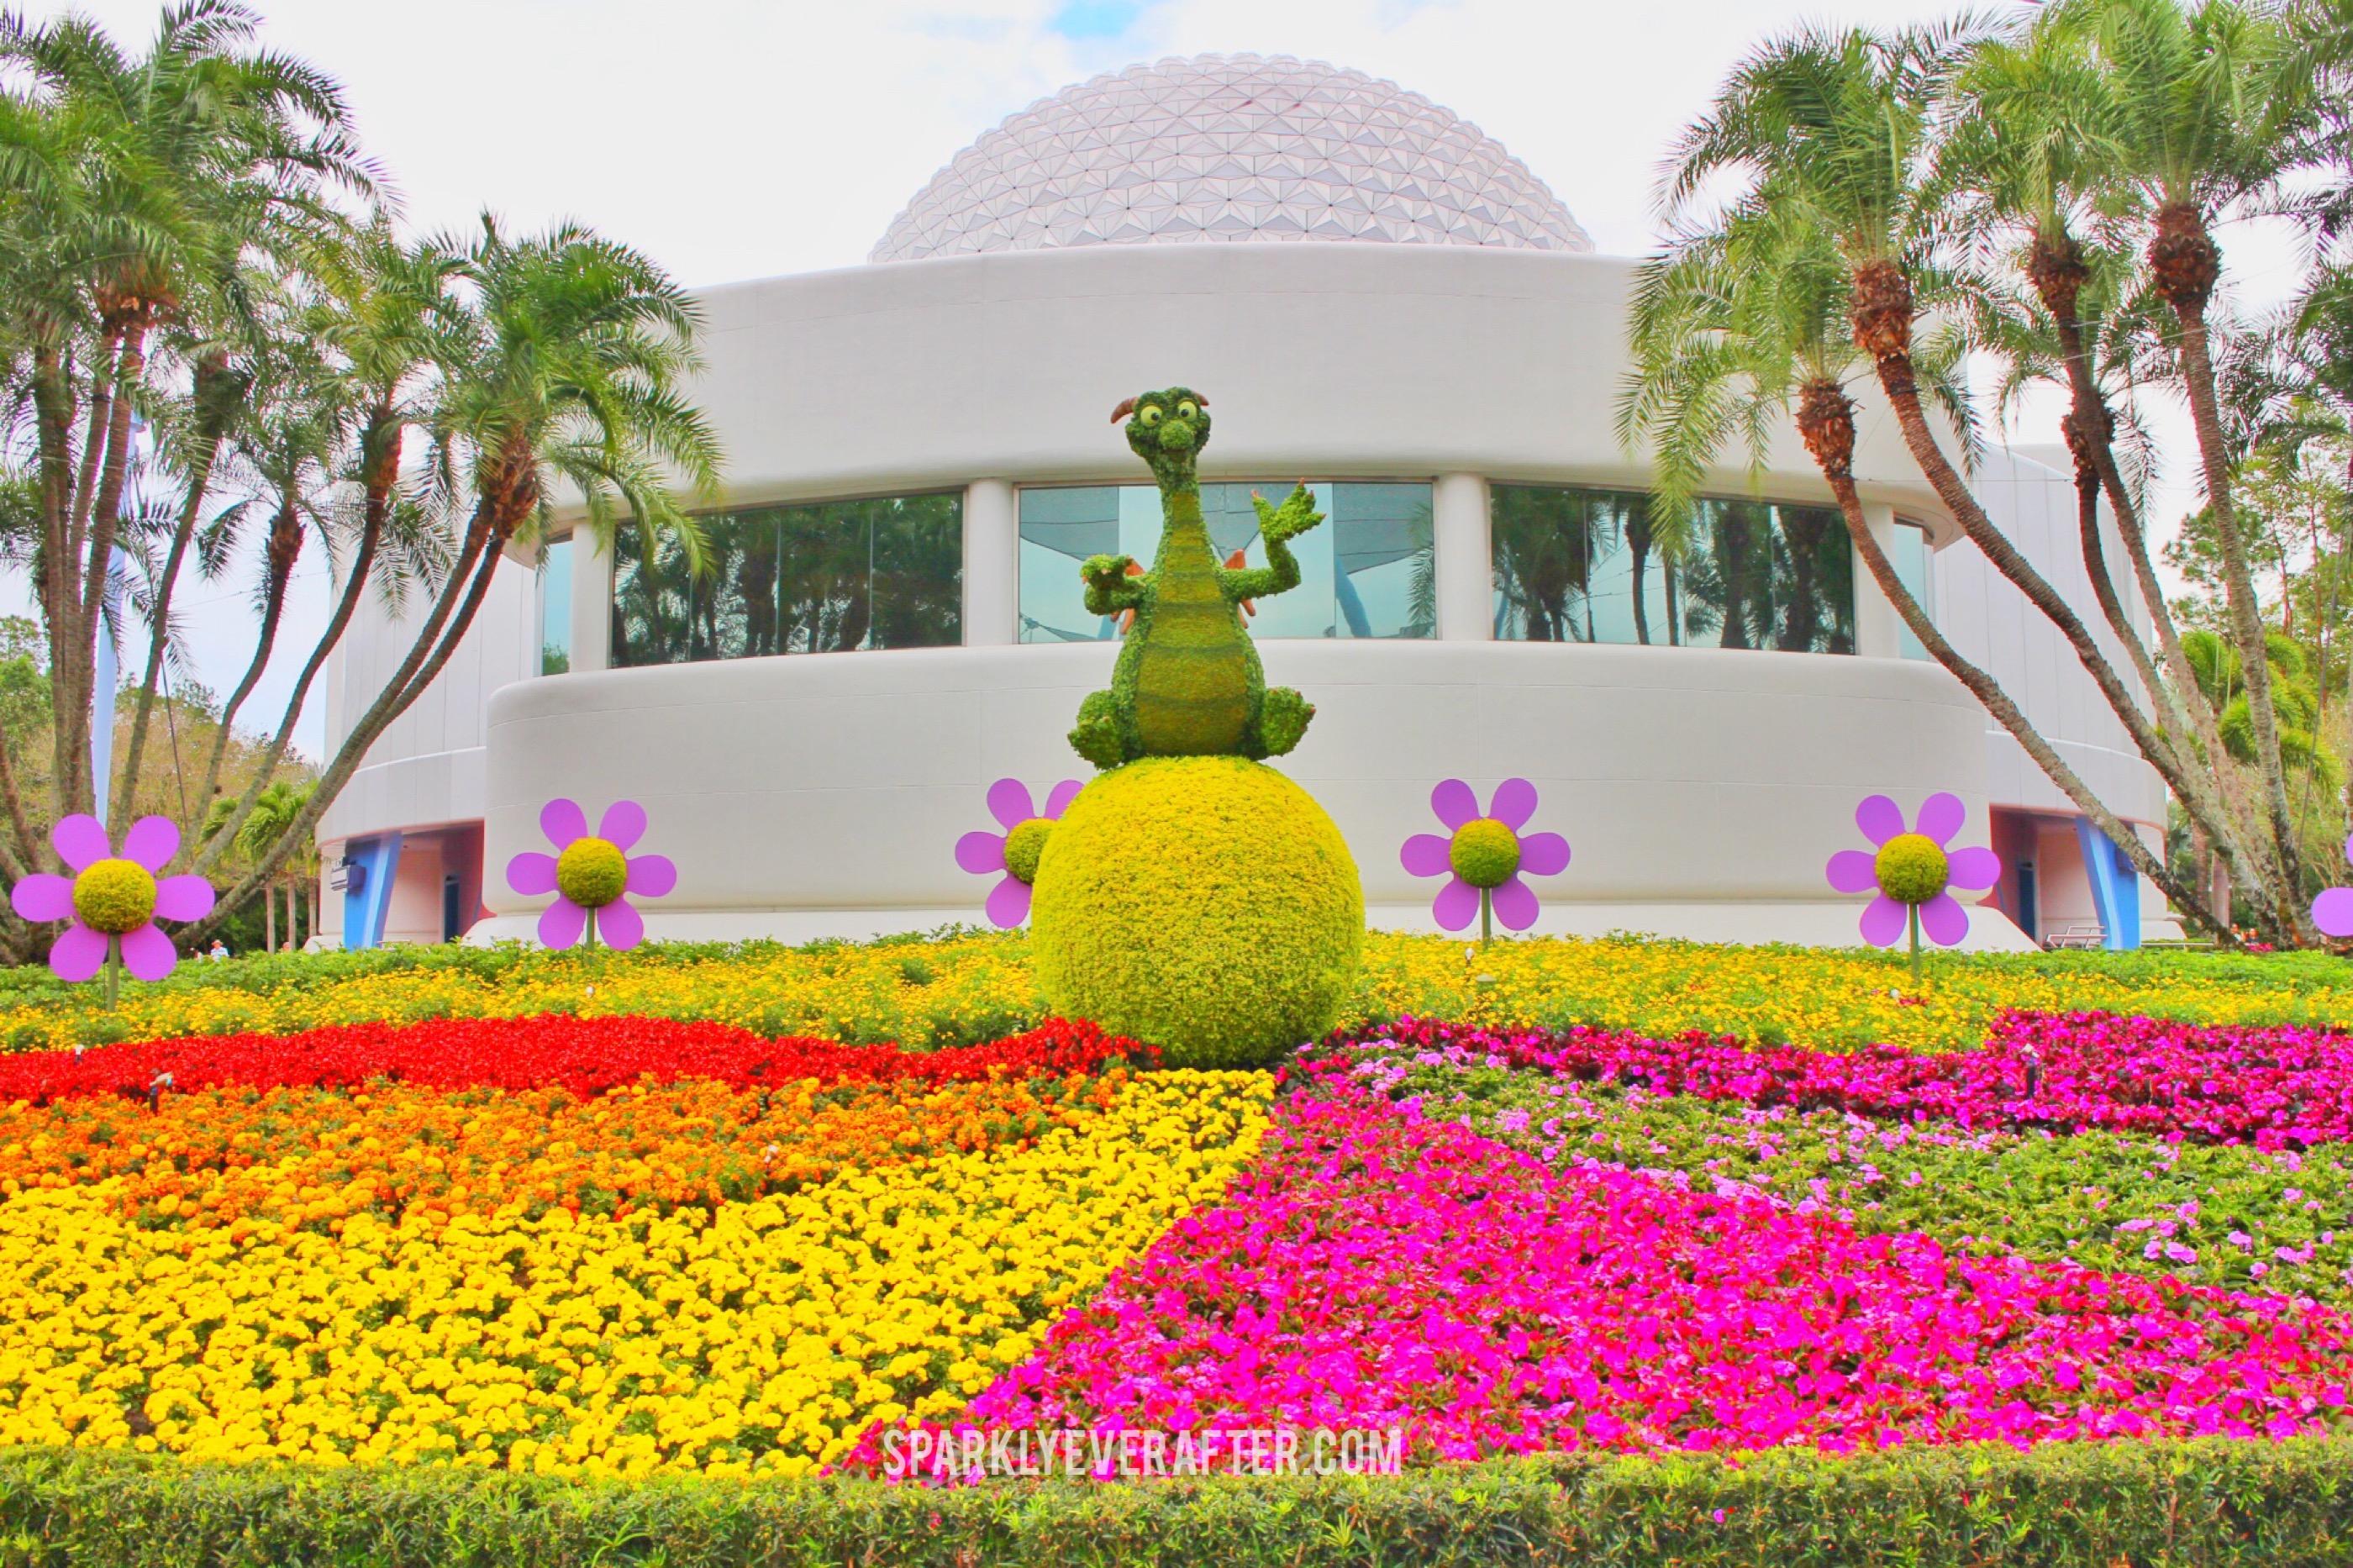 2017 epcot flower and garden festival overview - sparklyeverafter